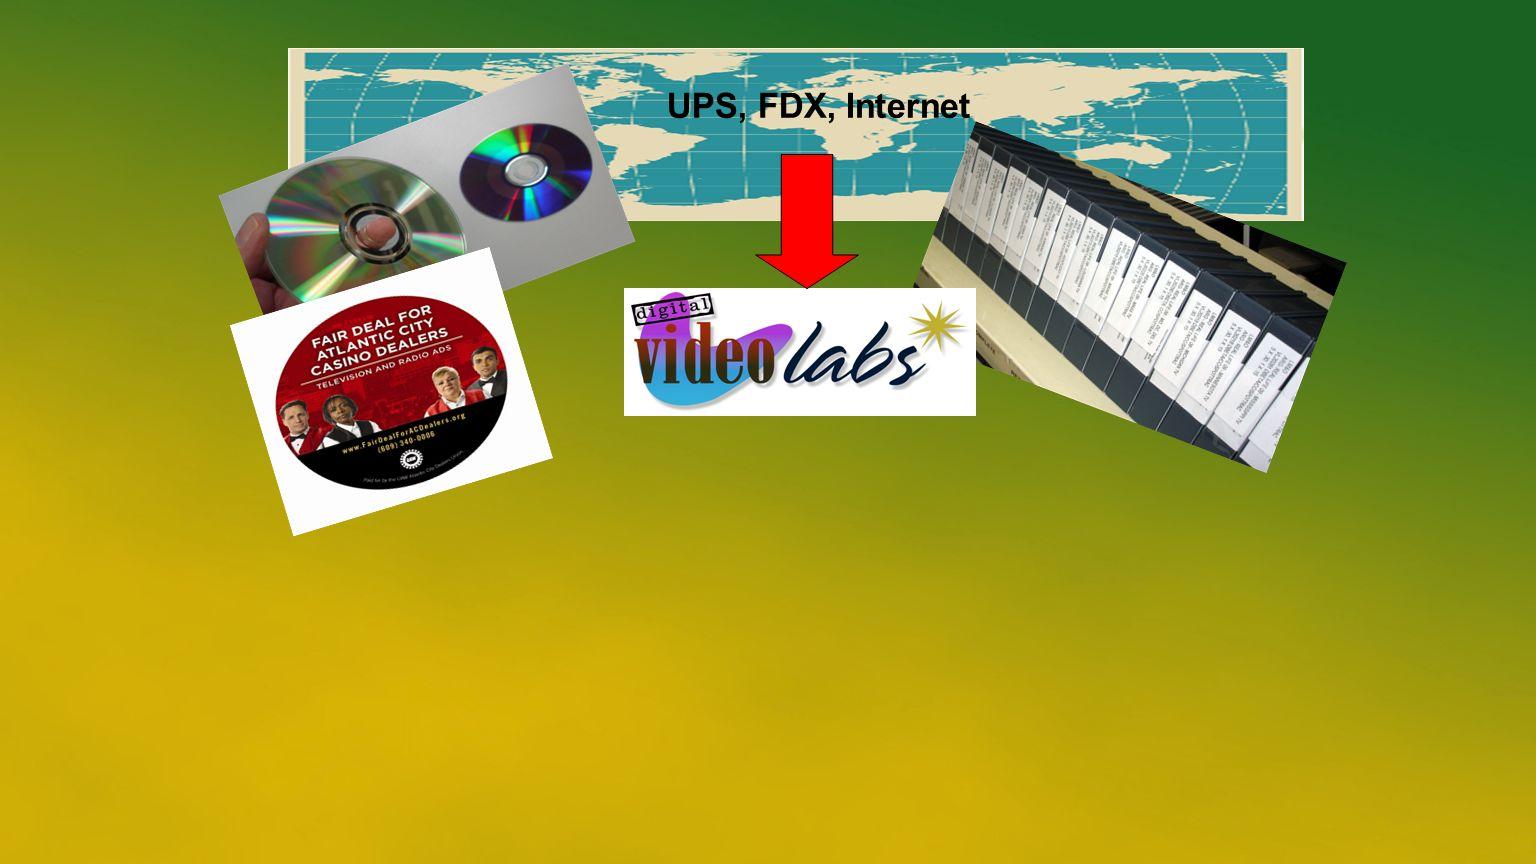 UPS, FDX, Internet